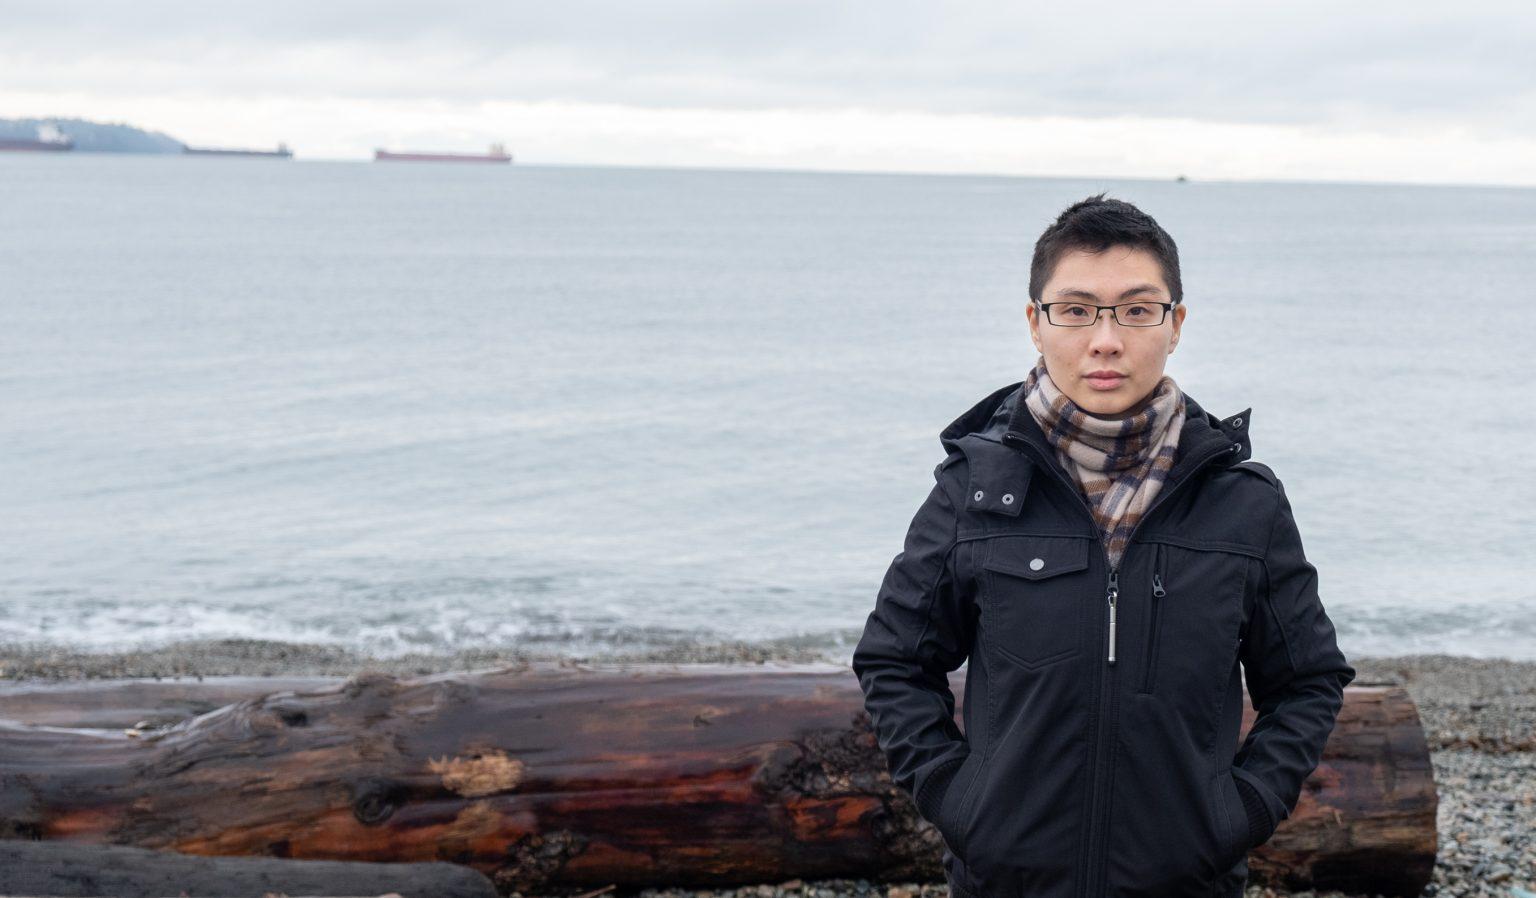 Meet our AsiaBerlin Ambassador : Athena Lam, Content Strategist